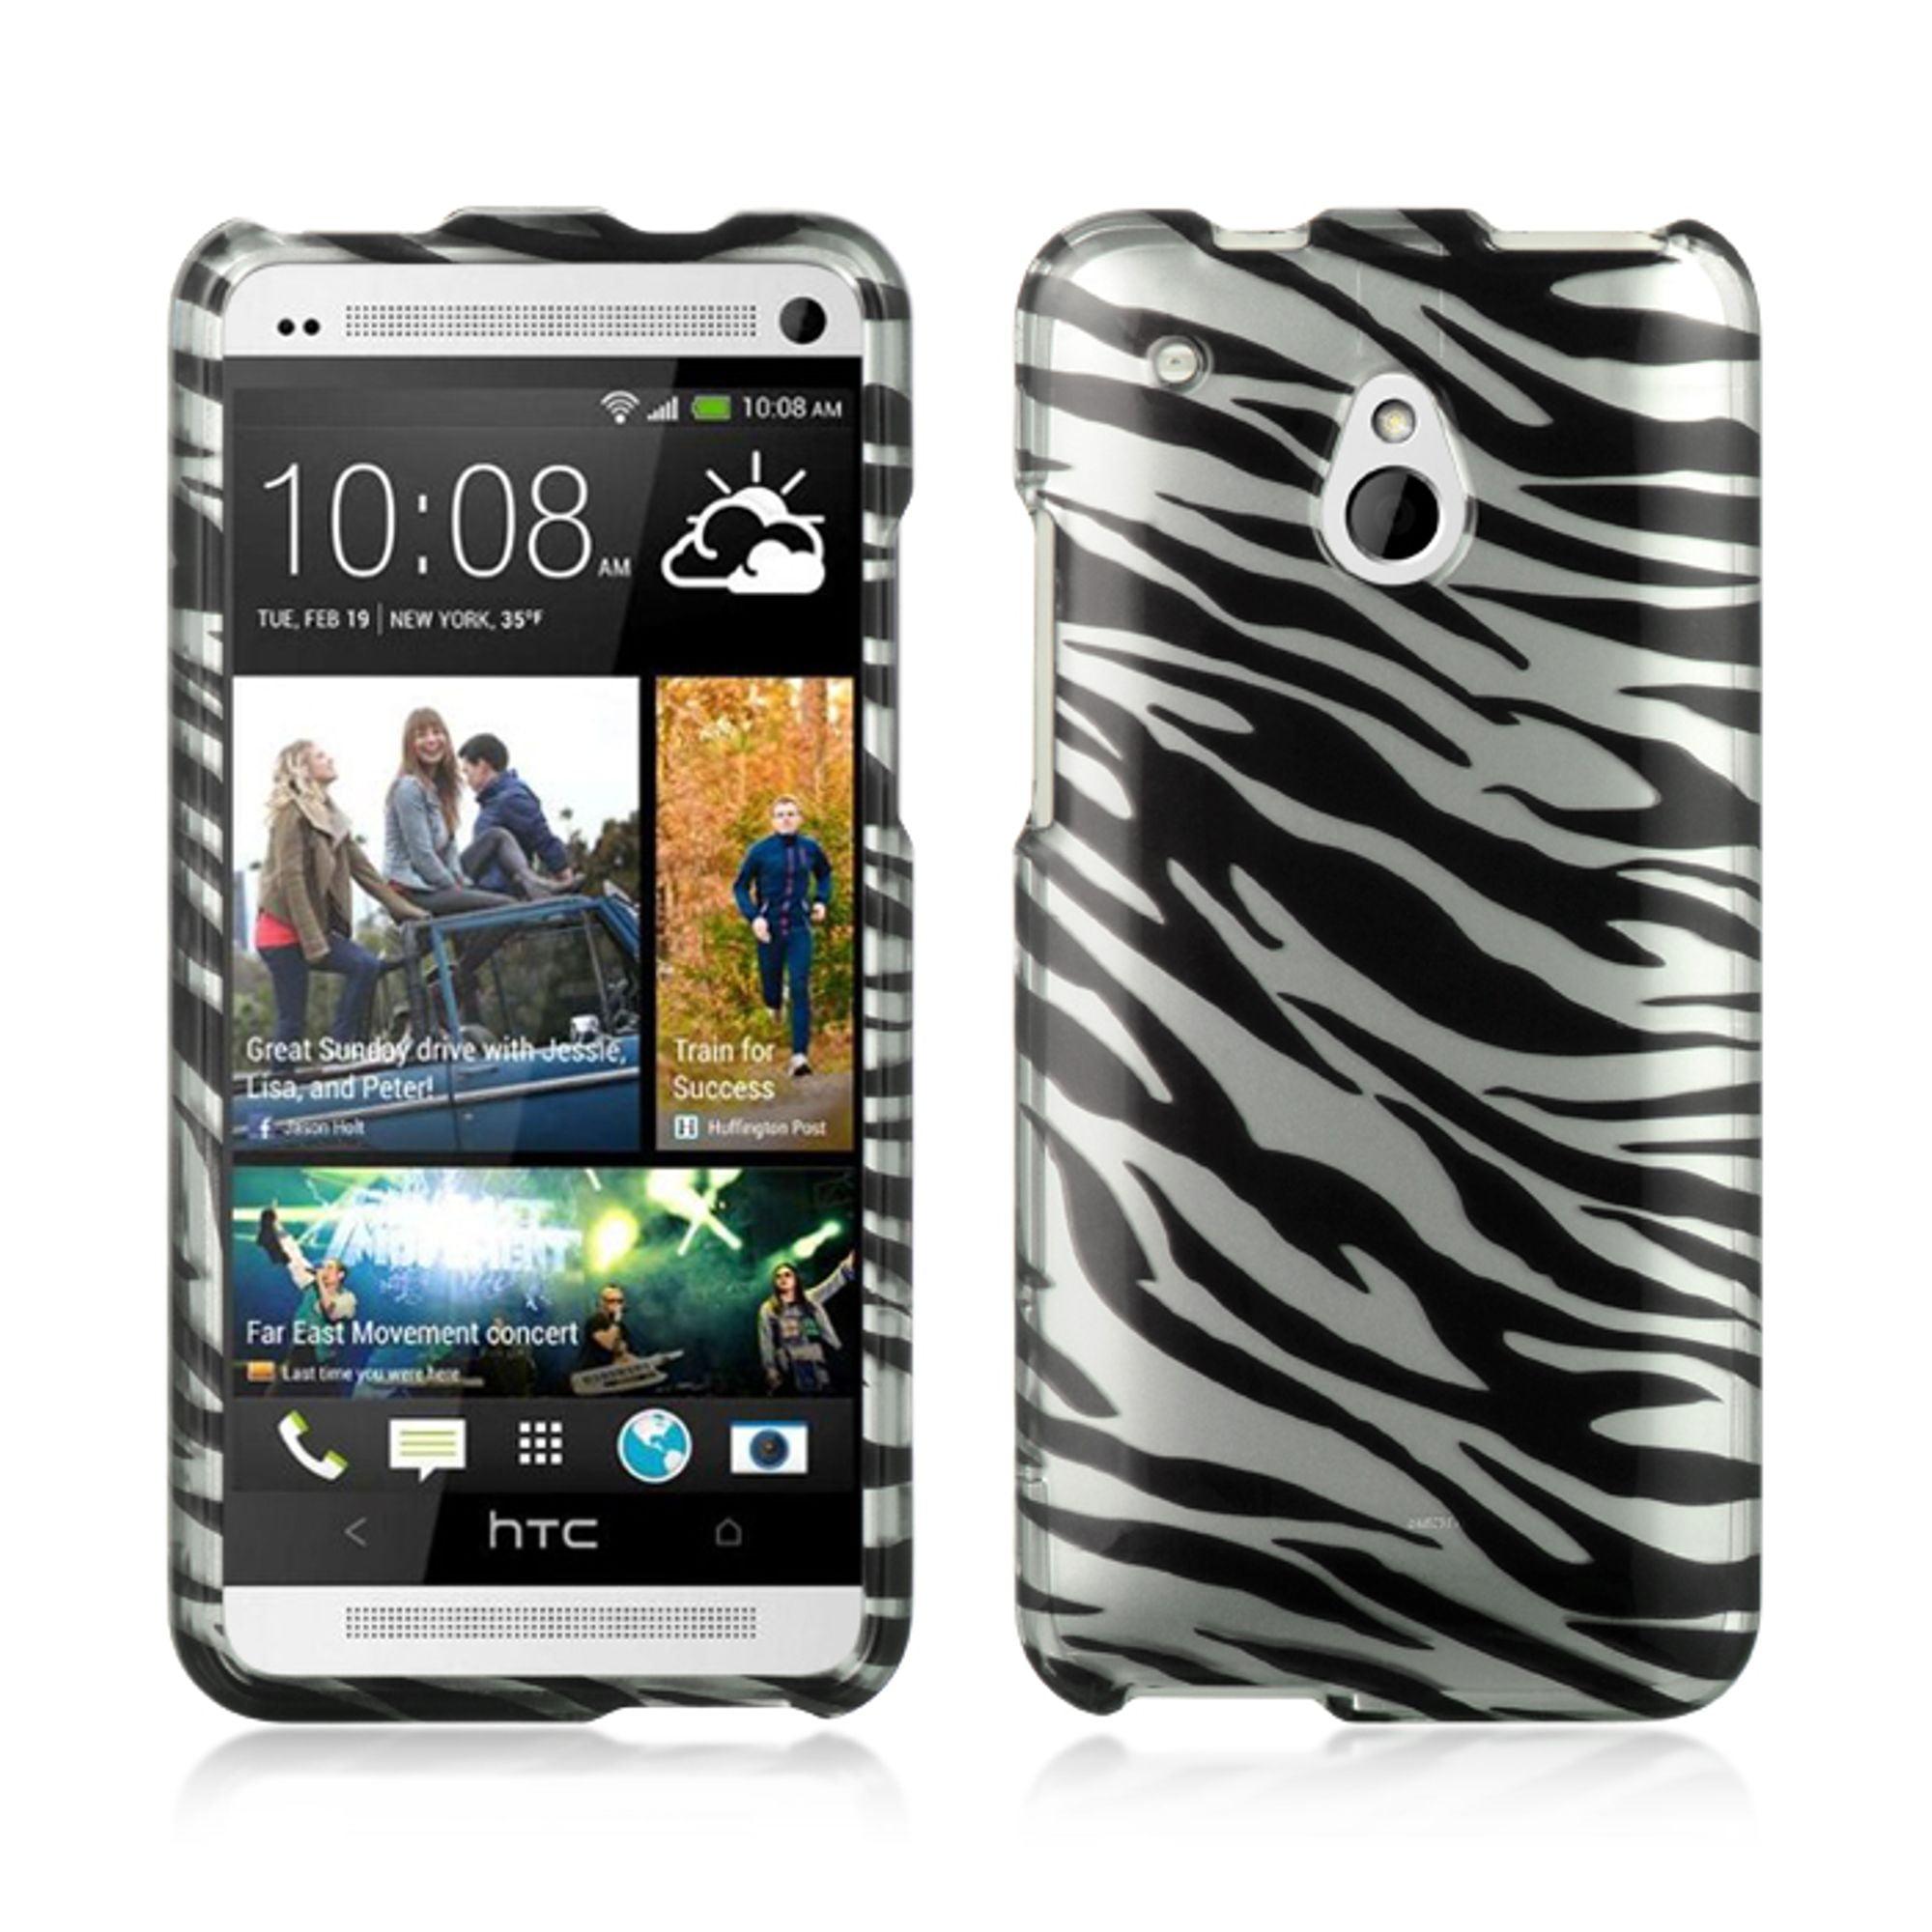 Insten Hard Rubber Case For HTC One Mini - Silver/Black